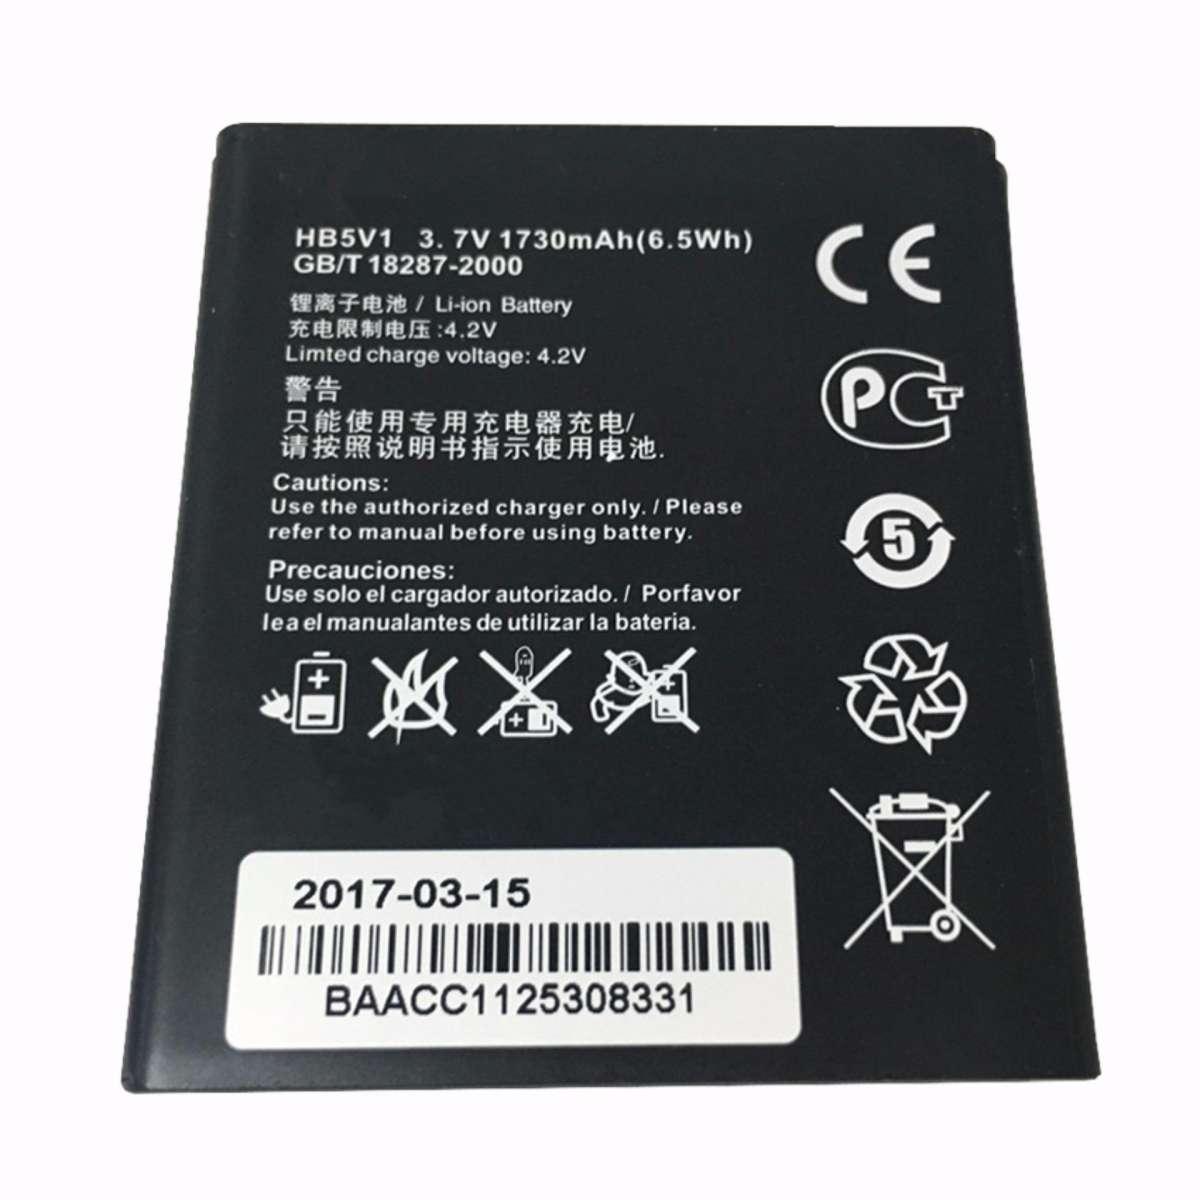 HB5V1 Battery for Huawei Y300 Y300C Y511 Y500 T8833 U883 1730mAh Mobile  Phone Battery